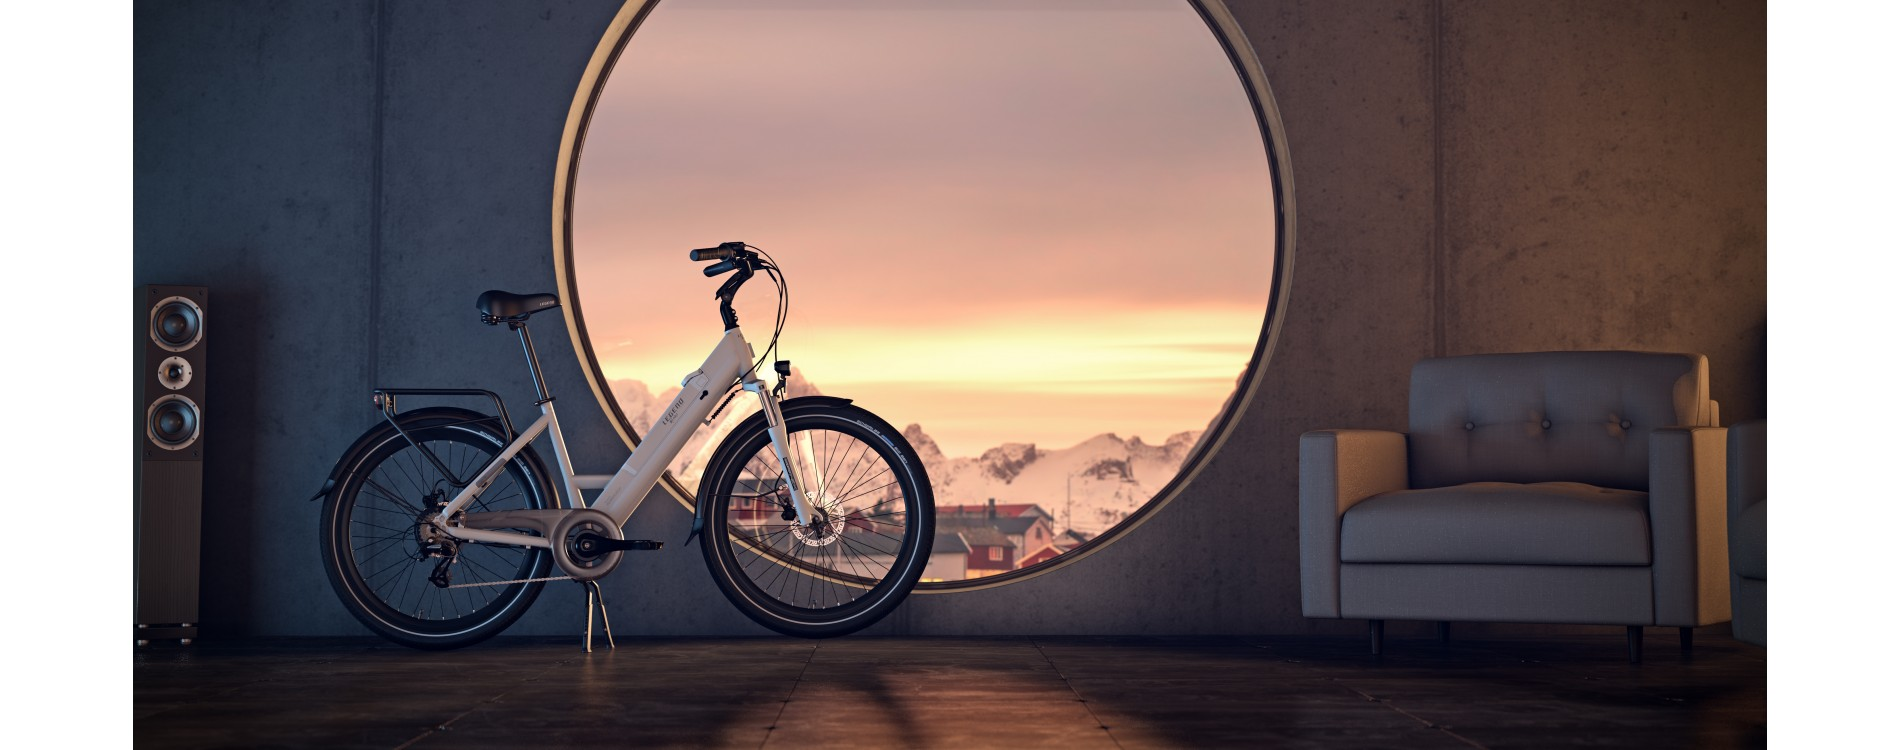 Milano Electric Bike 26 inch